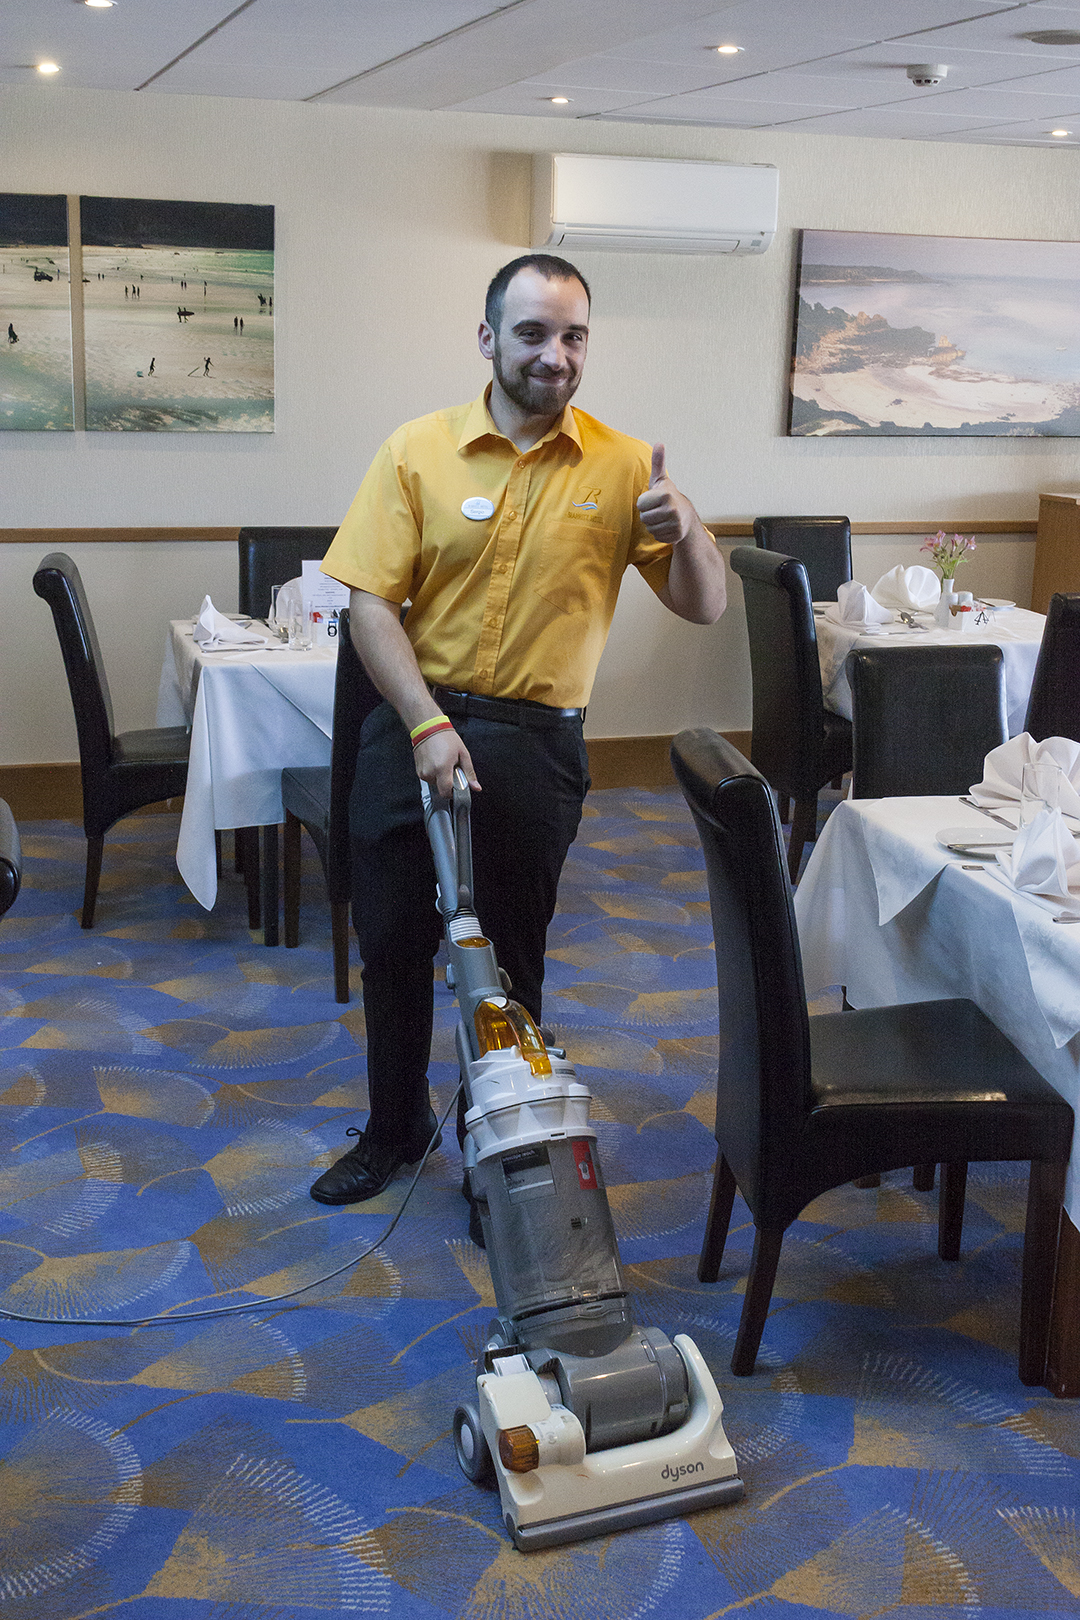 biarritz staff cleaning.jpg